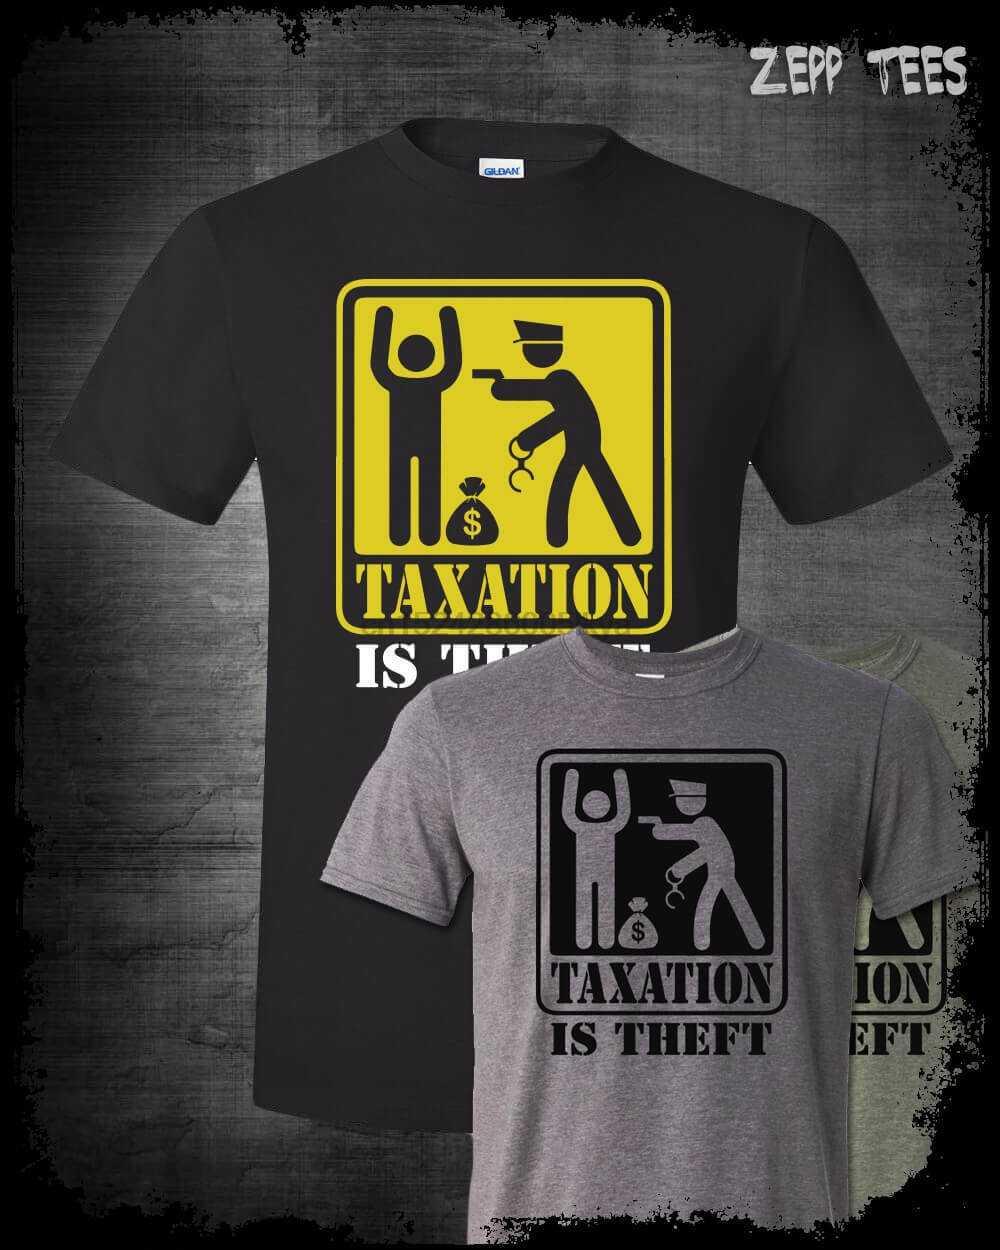 80b2220f6 Taxation Is Theft Warning Shirt Ron Paul Libertarian Anti Taxes Alex Jones  1776